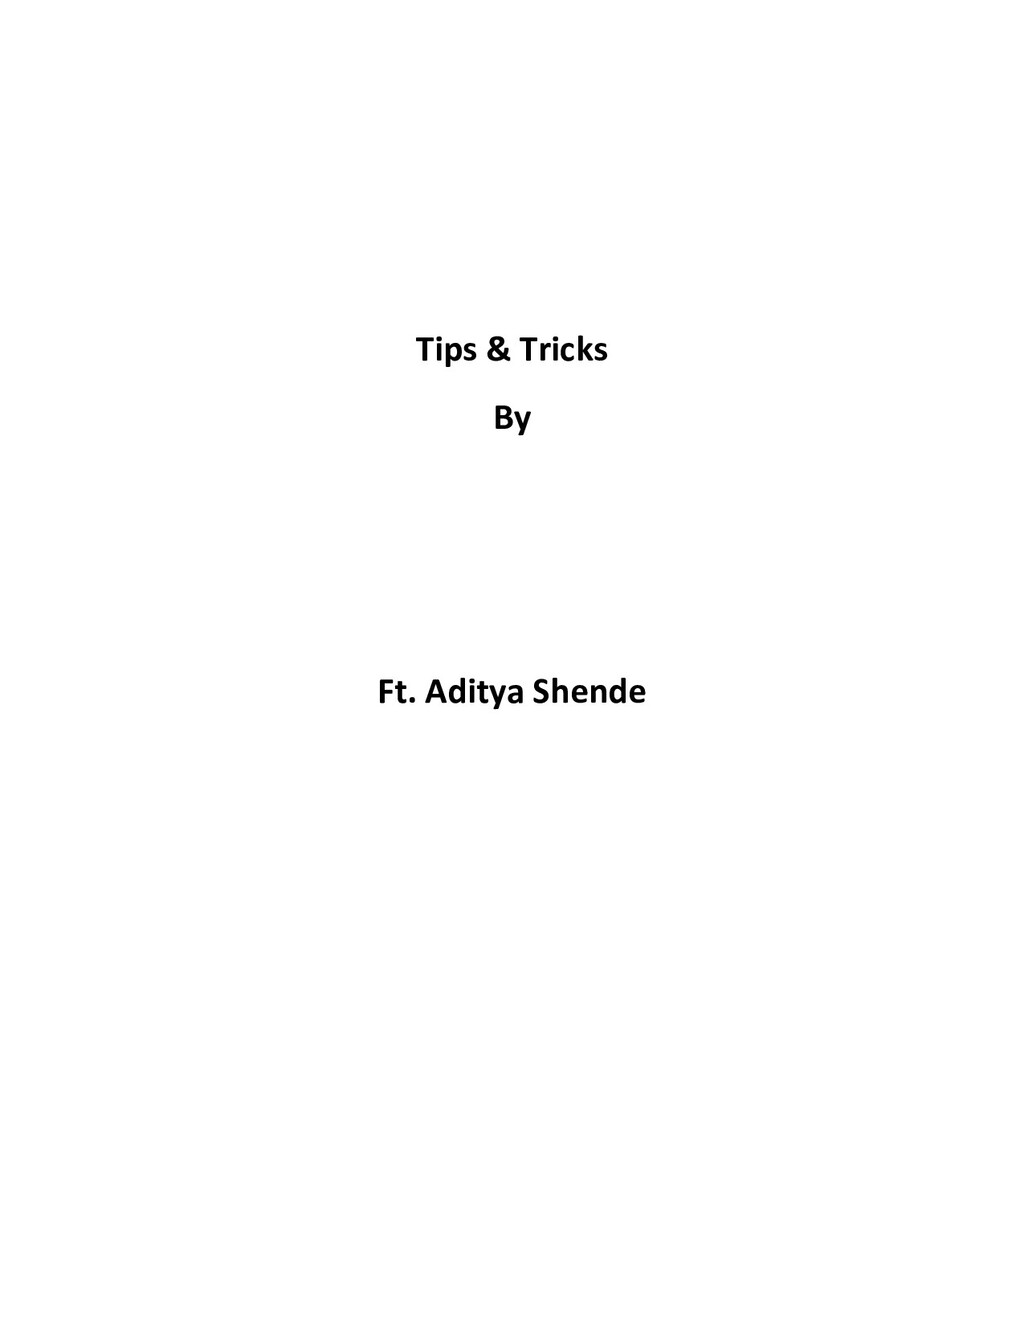 Tips & Tricks By Ft. Aditya Shende